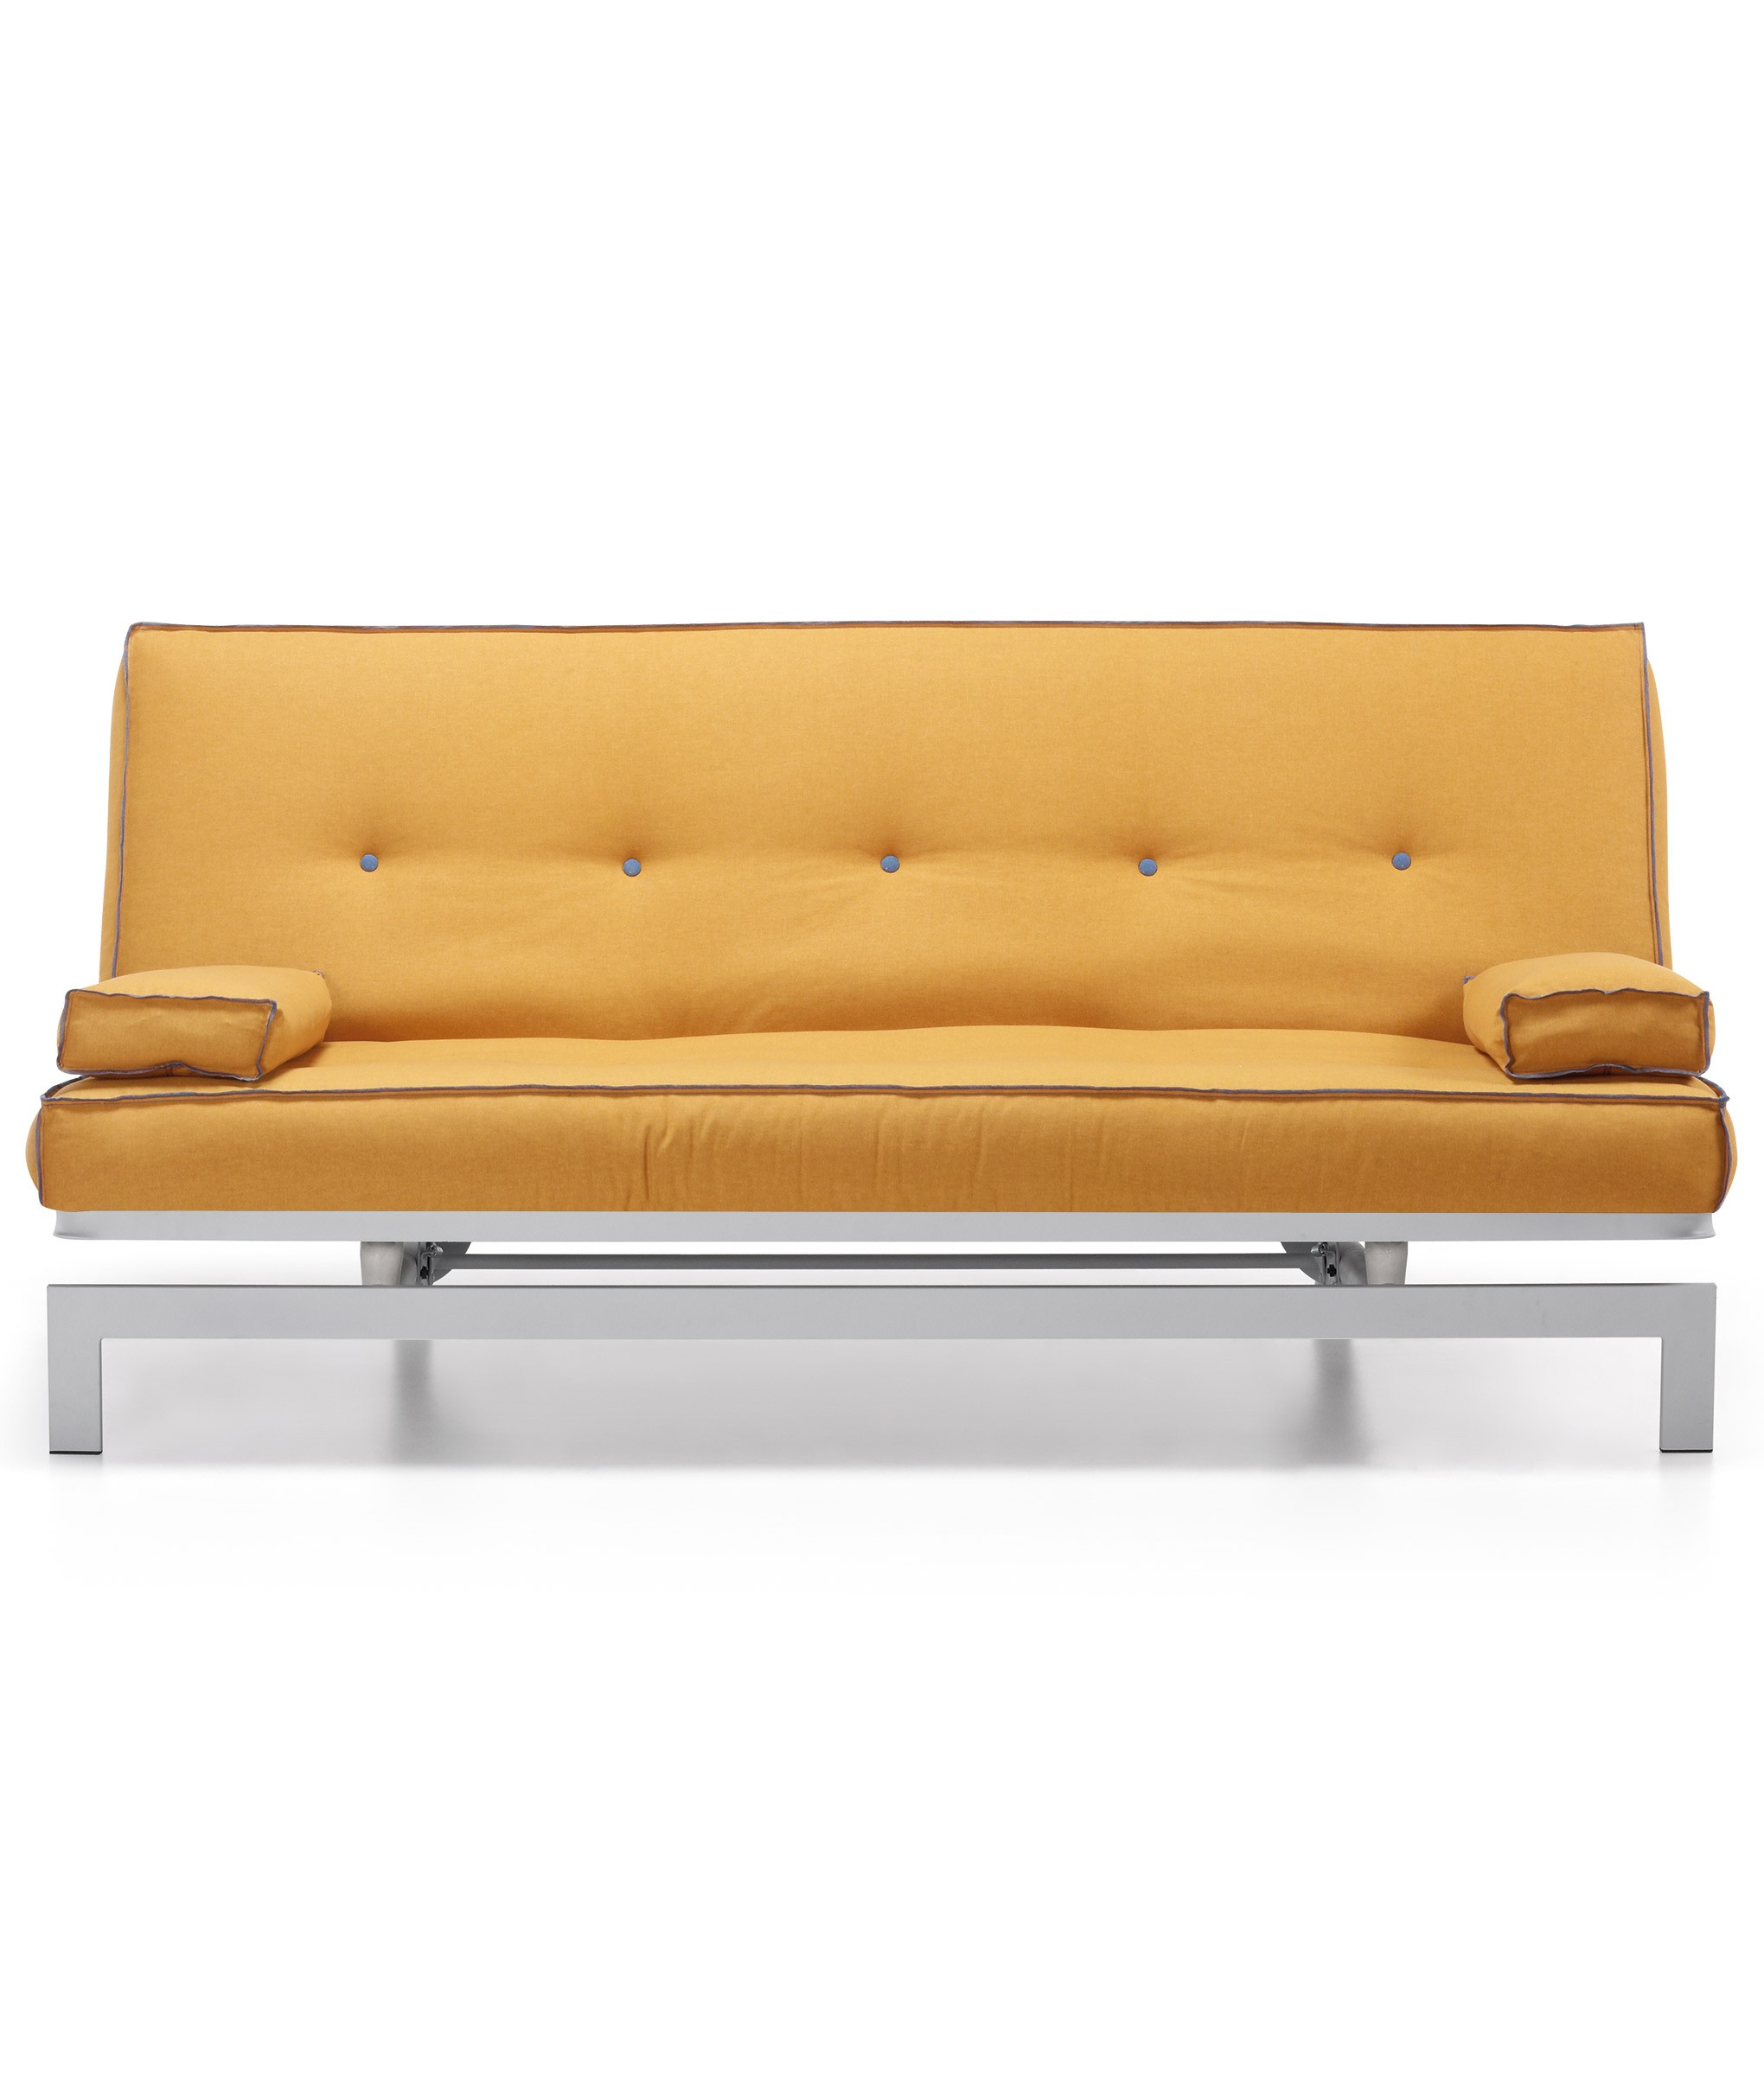 Sofa cama libro gio hogarterapia com for Colchon para sofa cama libro